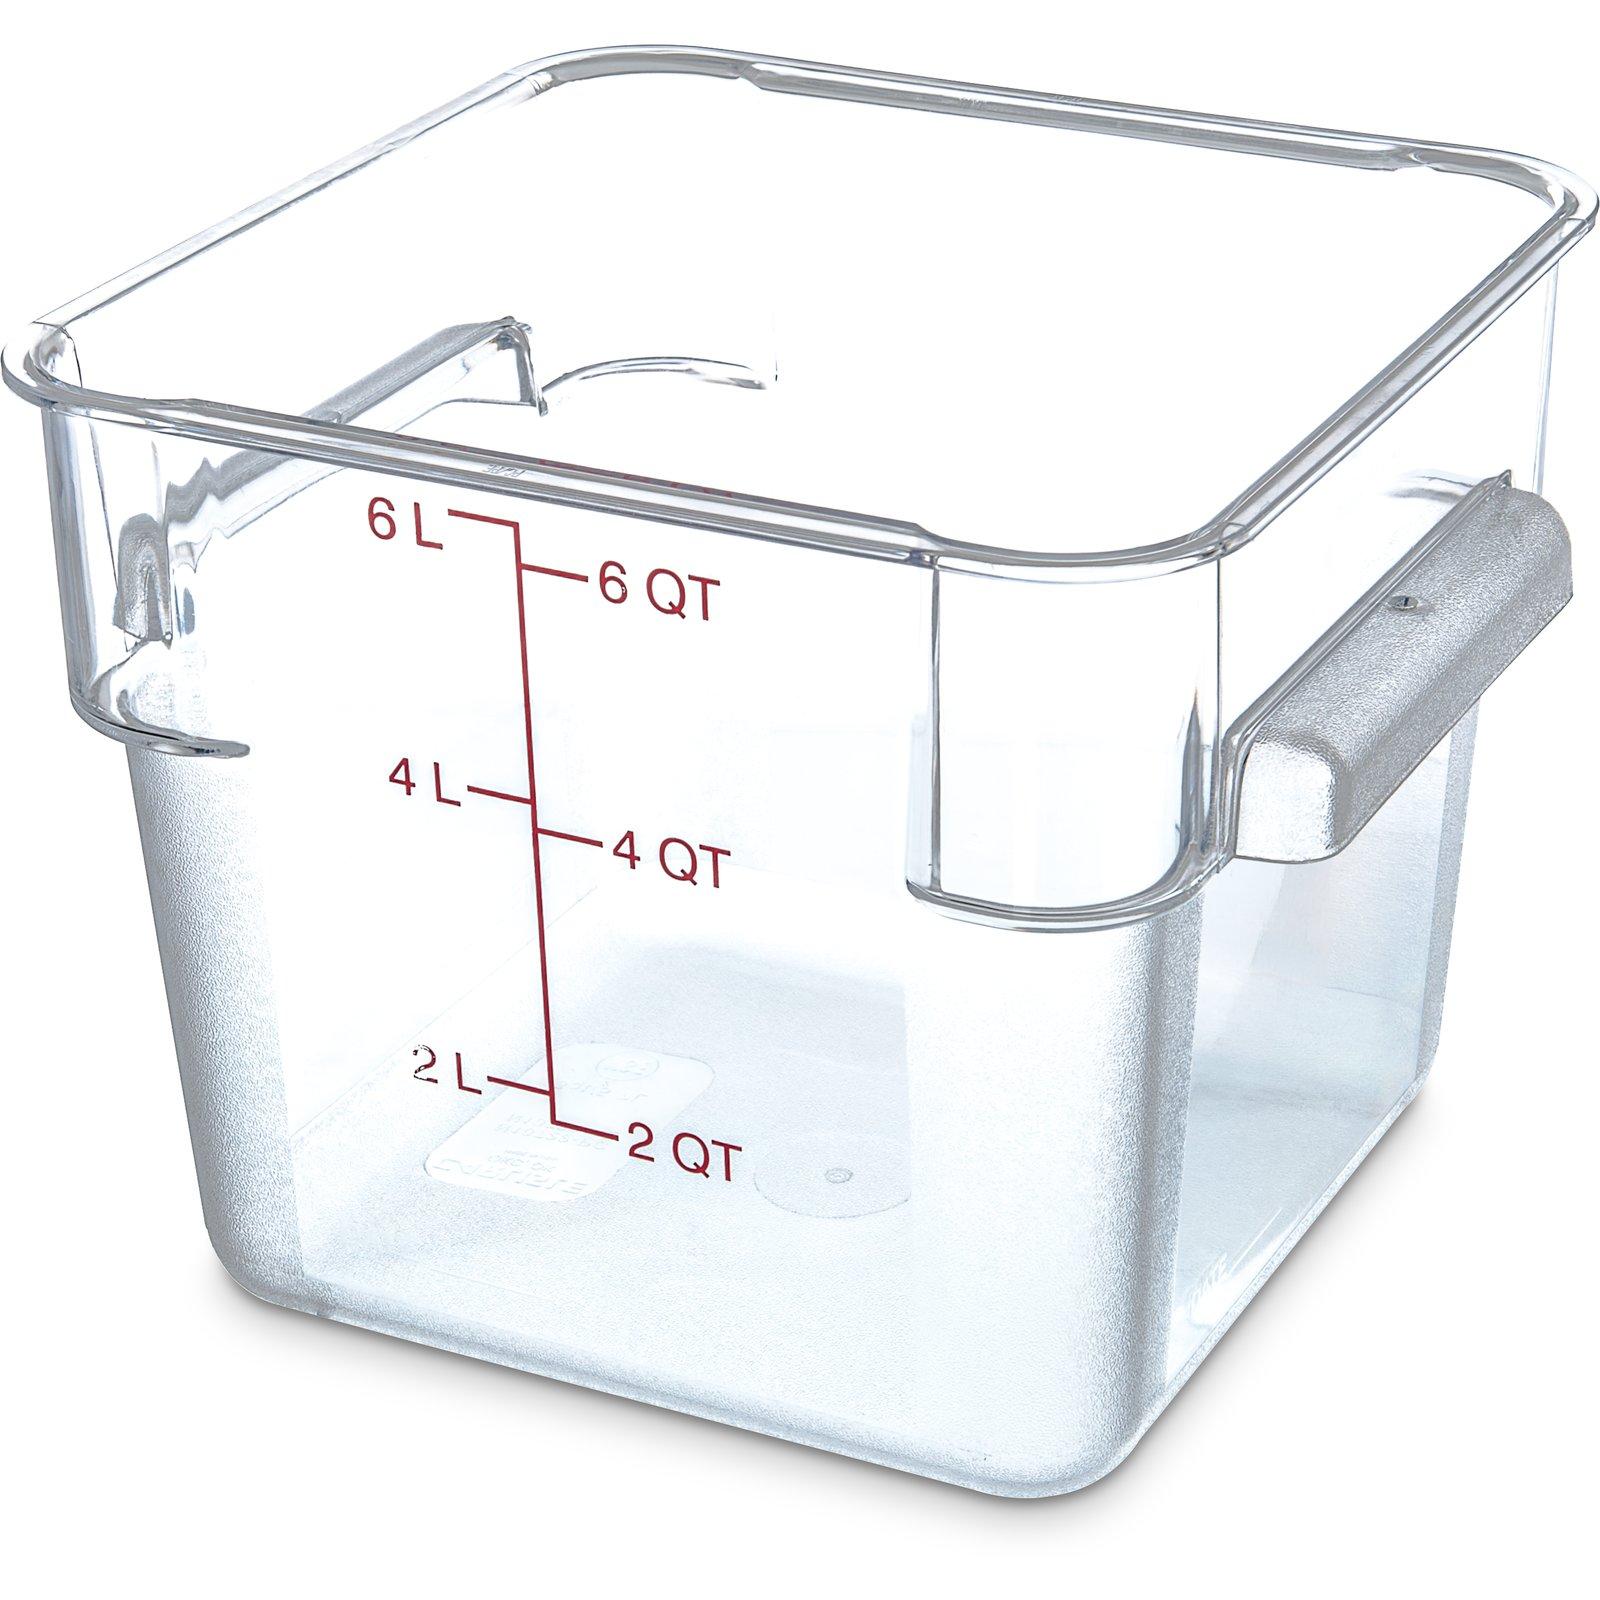 1072207 StorPlus Polycarbonate Square Food Storage Container 6 qt